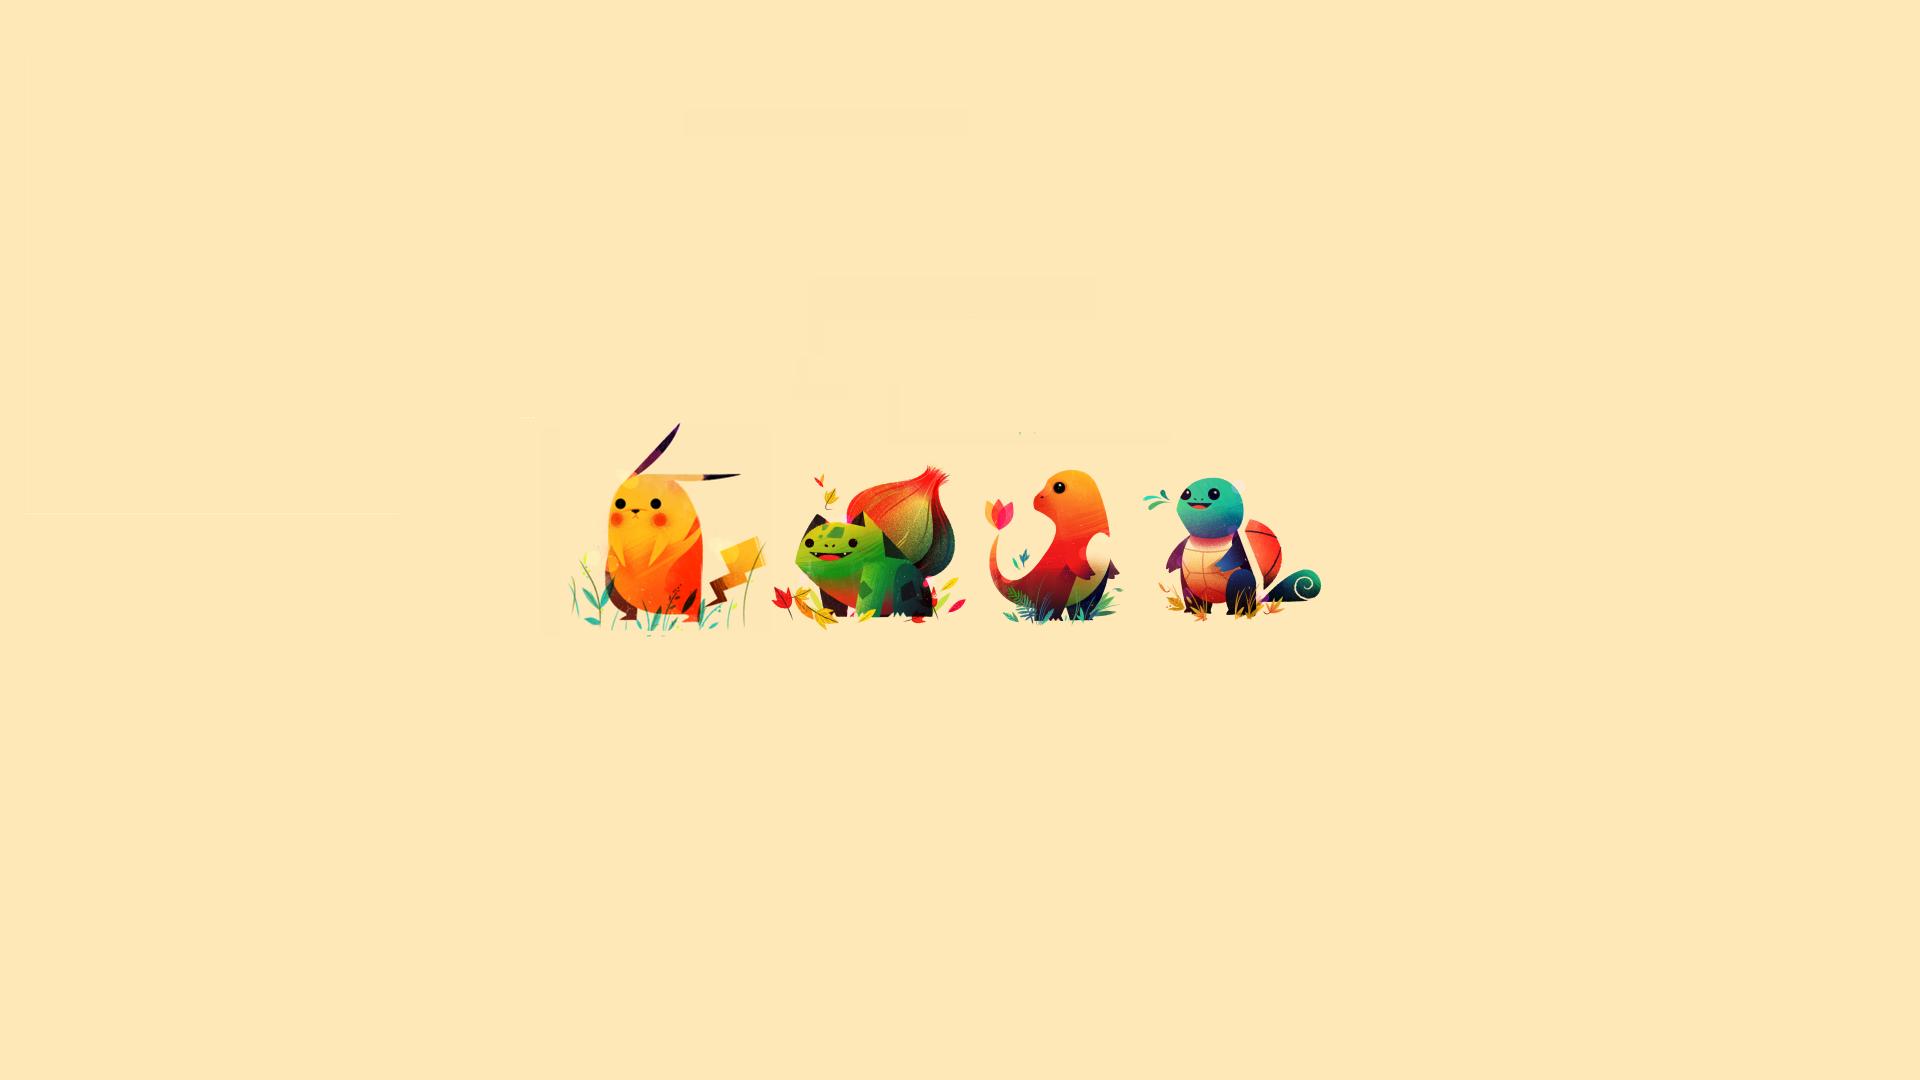 Pokemon Art iPad Wallpaper   Download iPad wallpapers 1920x1080